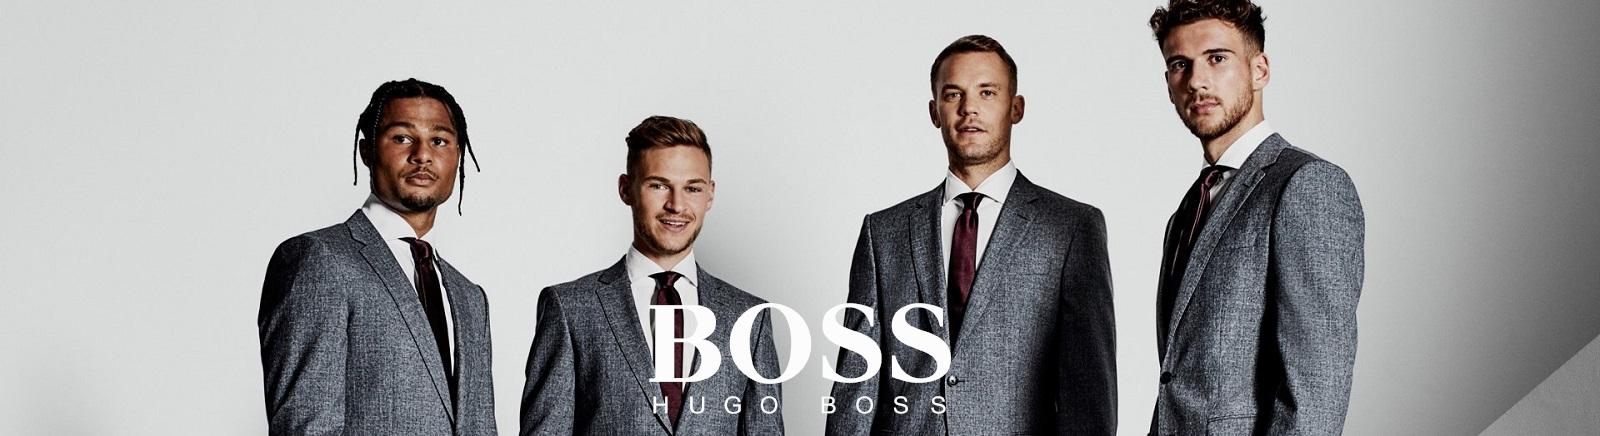 BOSS Markenschuhe aus Leder bei Prange Schuhe online kaufen